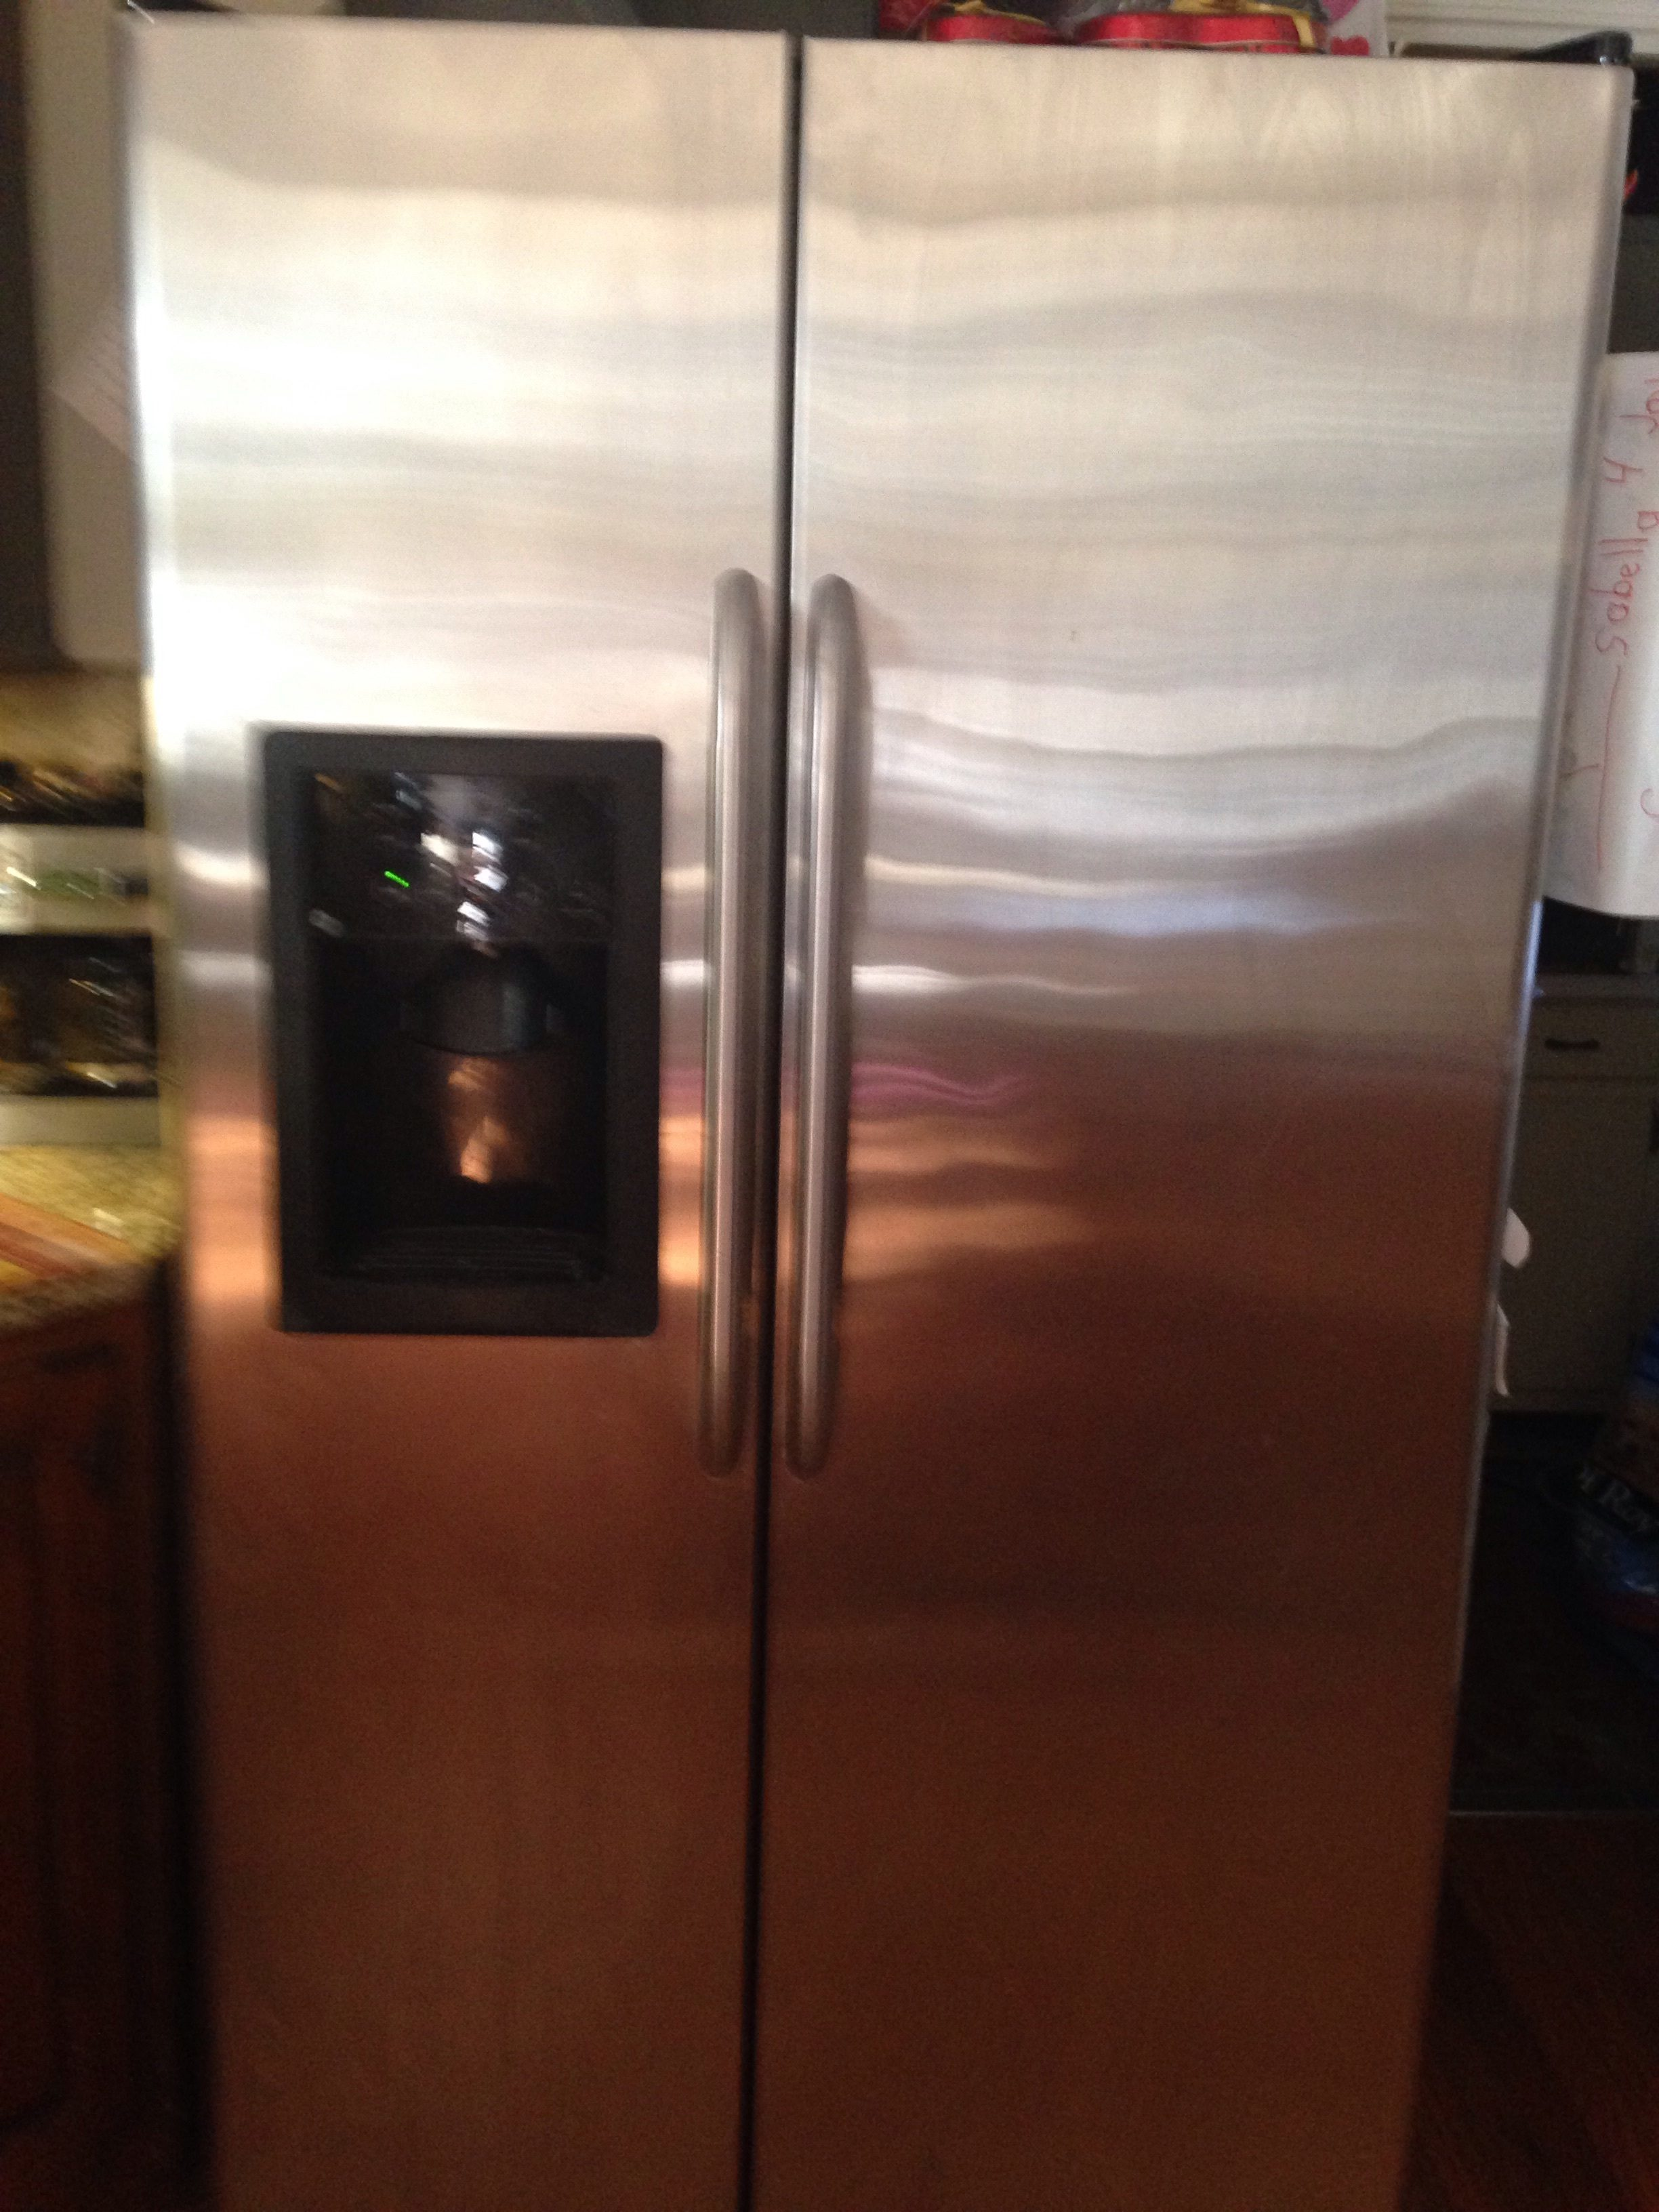 Ge Profile Refrigerator Problems Ge Profile Refrigerator Problems Not Cooling Refrigerator Repair